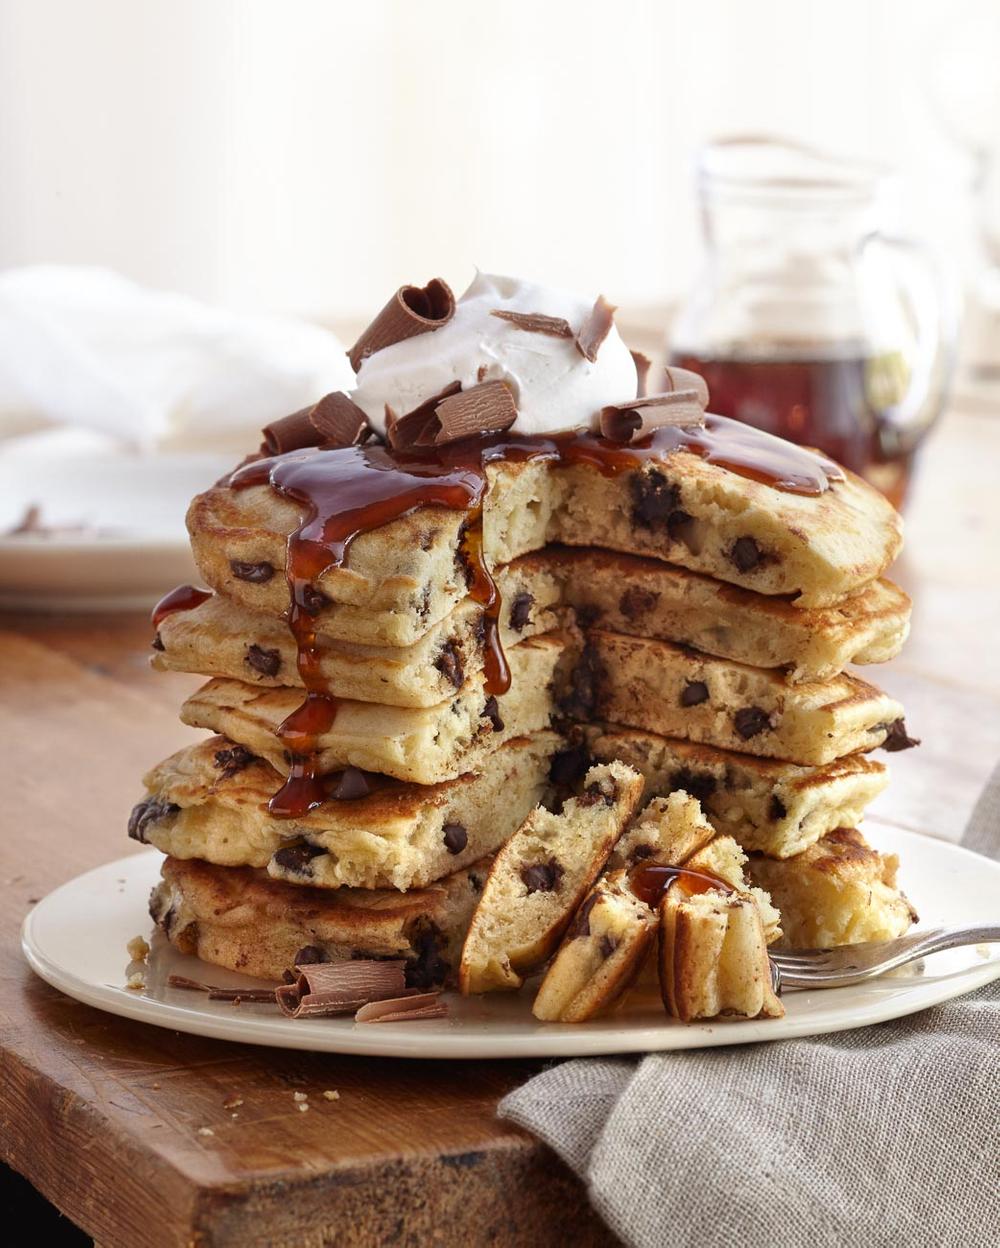 chocolate-chip-pancakes-food-stylist-san-francisco.jpg